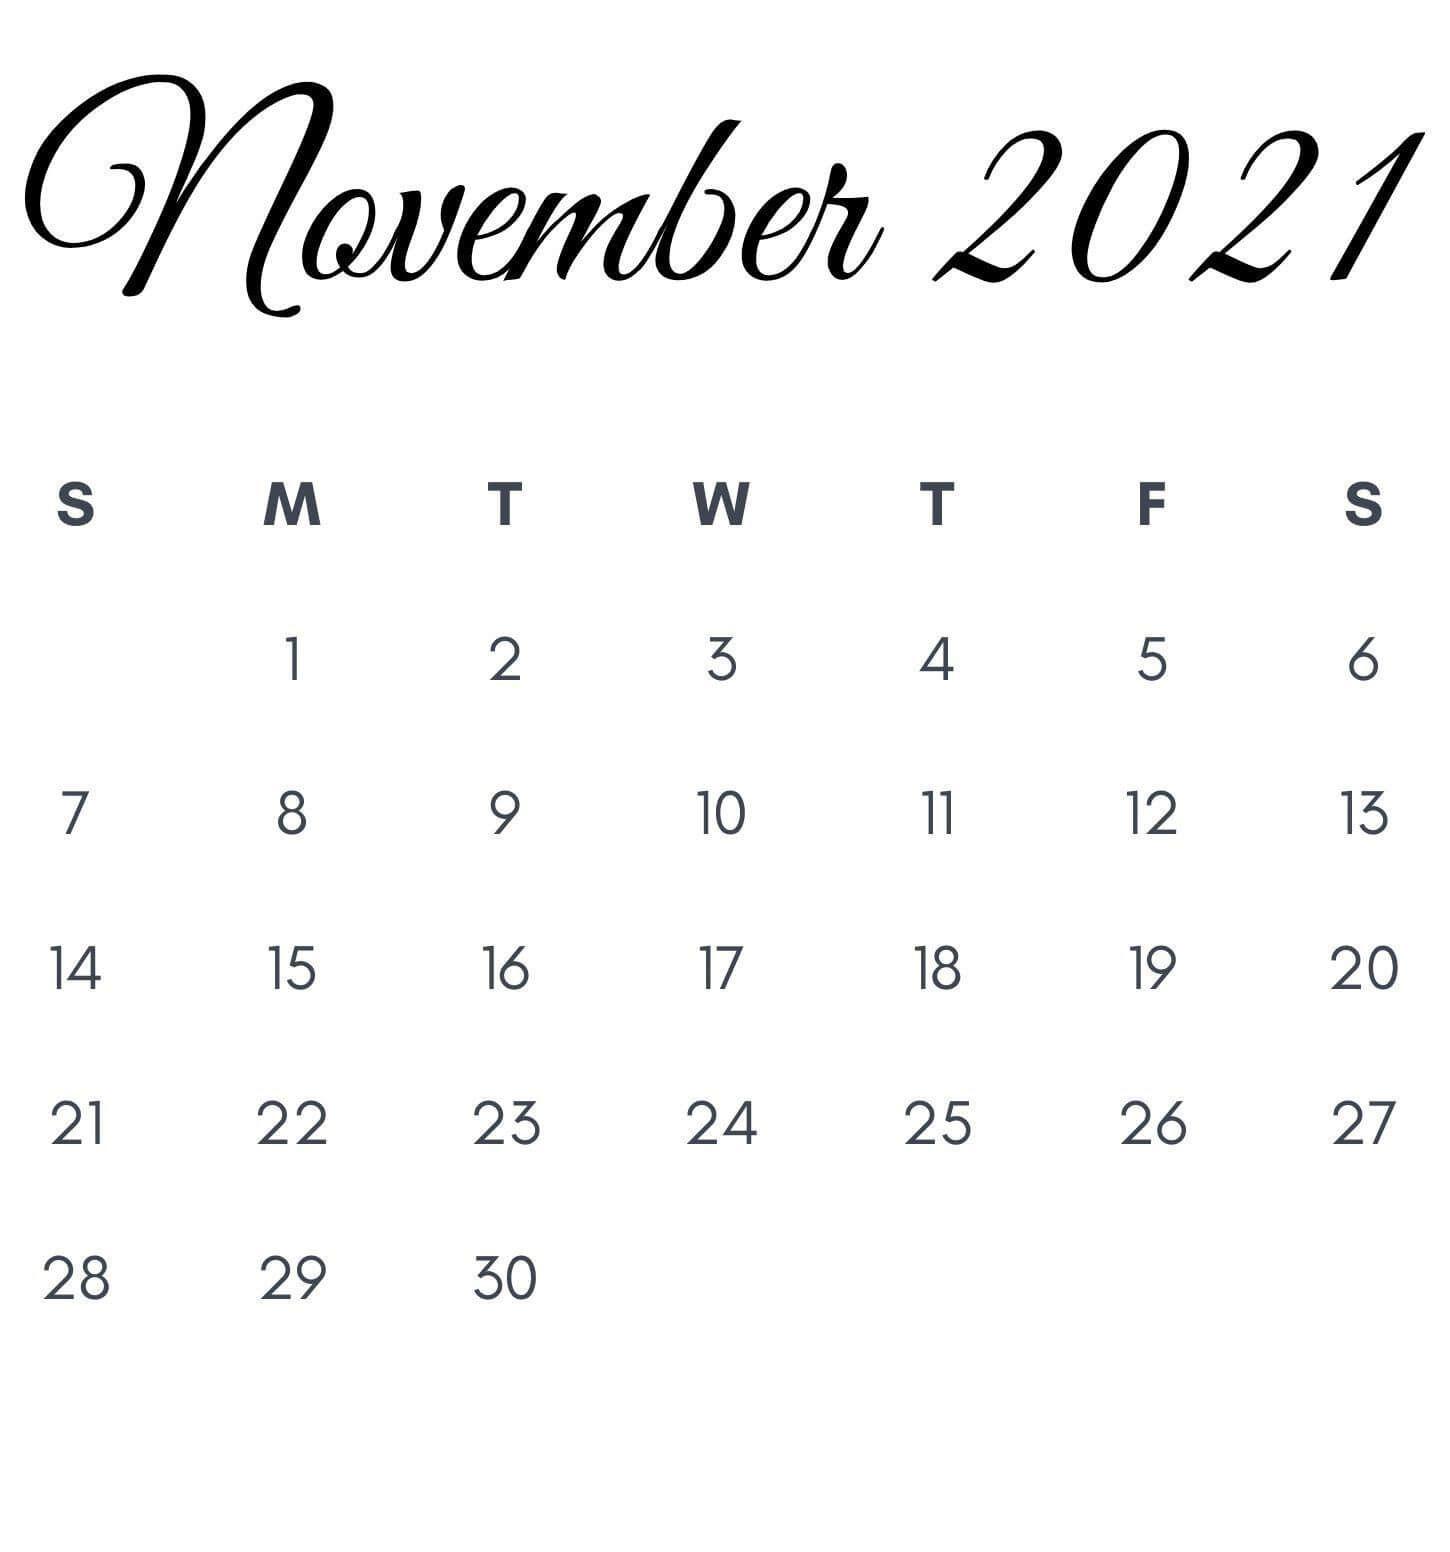 November 2021 Calendar Printable Template Pdf Word Excel Free Printable Calendar Templates Calendar Printables Monthly Calendar Printable